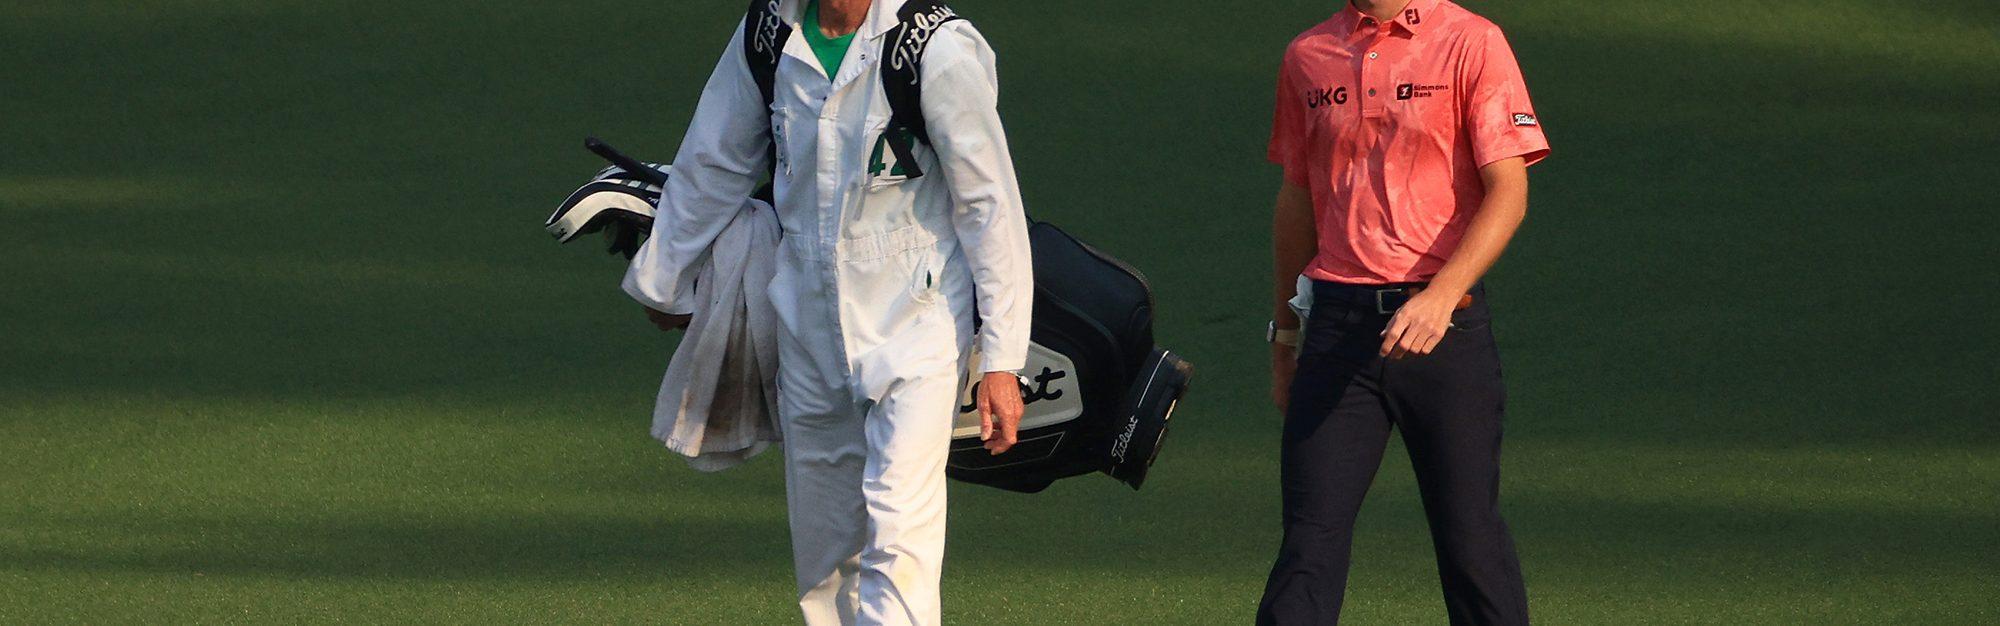 What's in Will Zalatoris's bag?